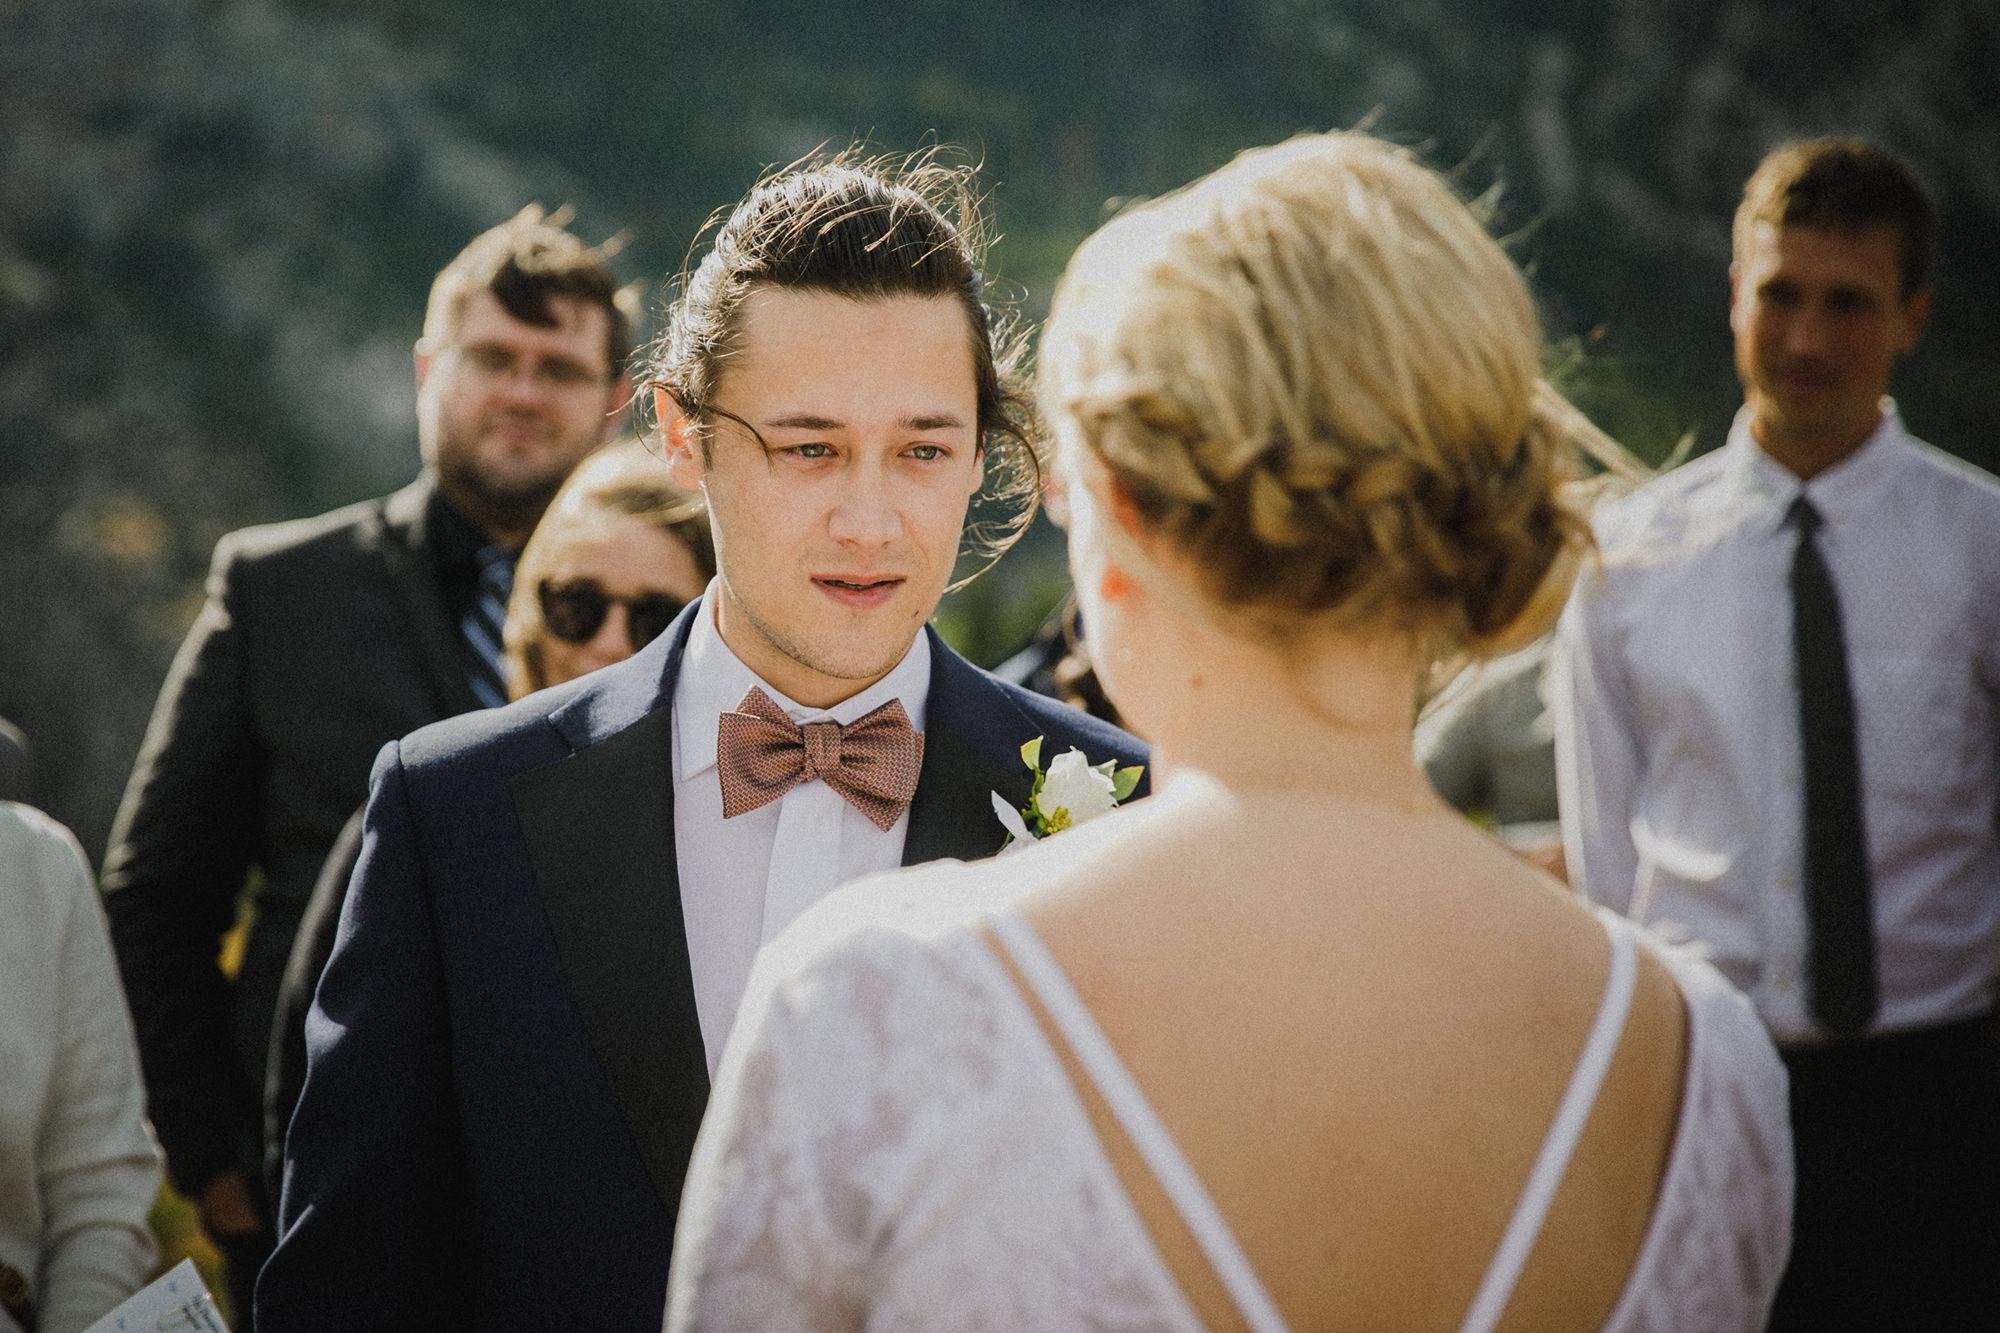 Waterton Wedding David Guenther -36.JPG